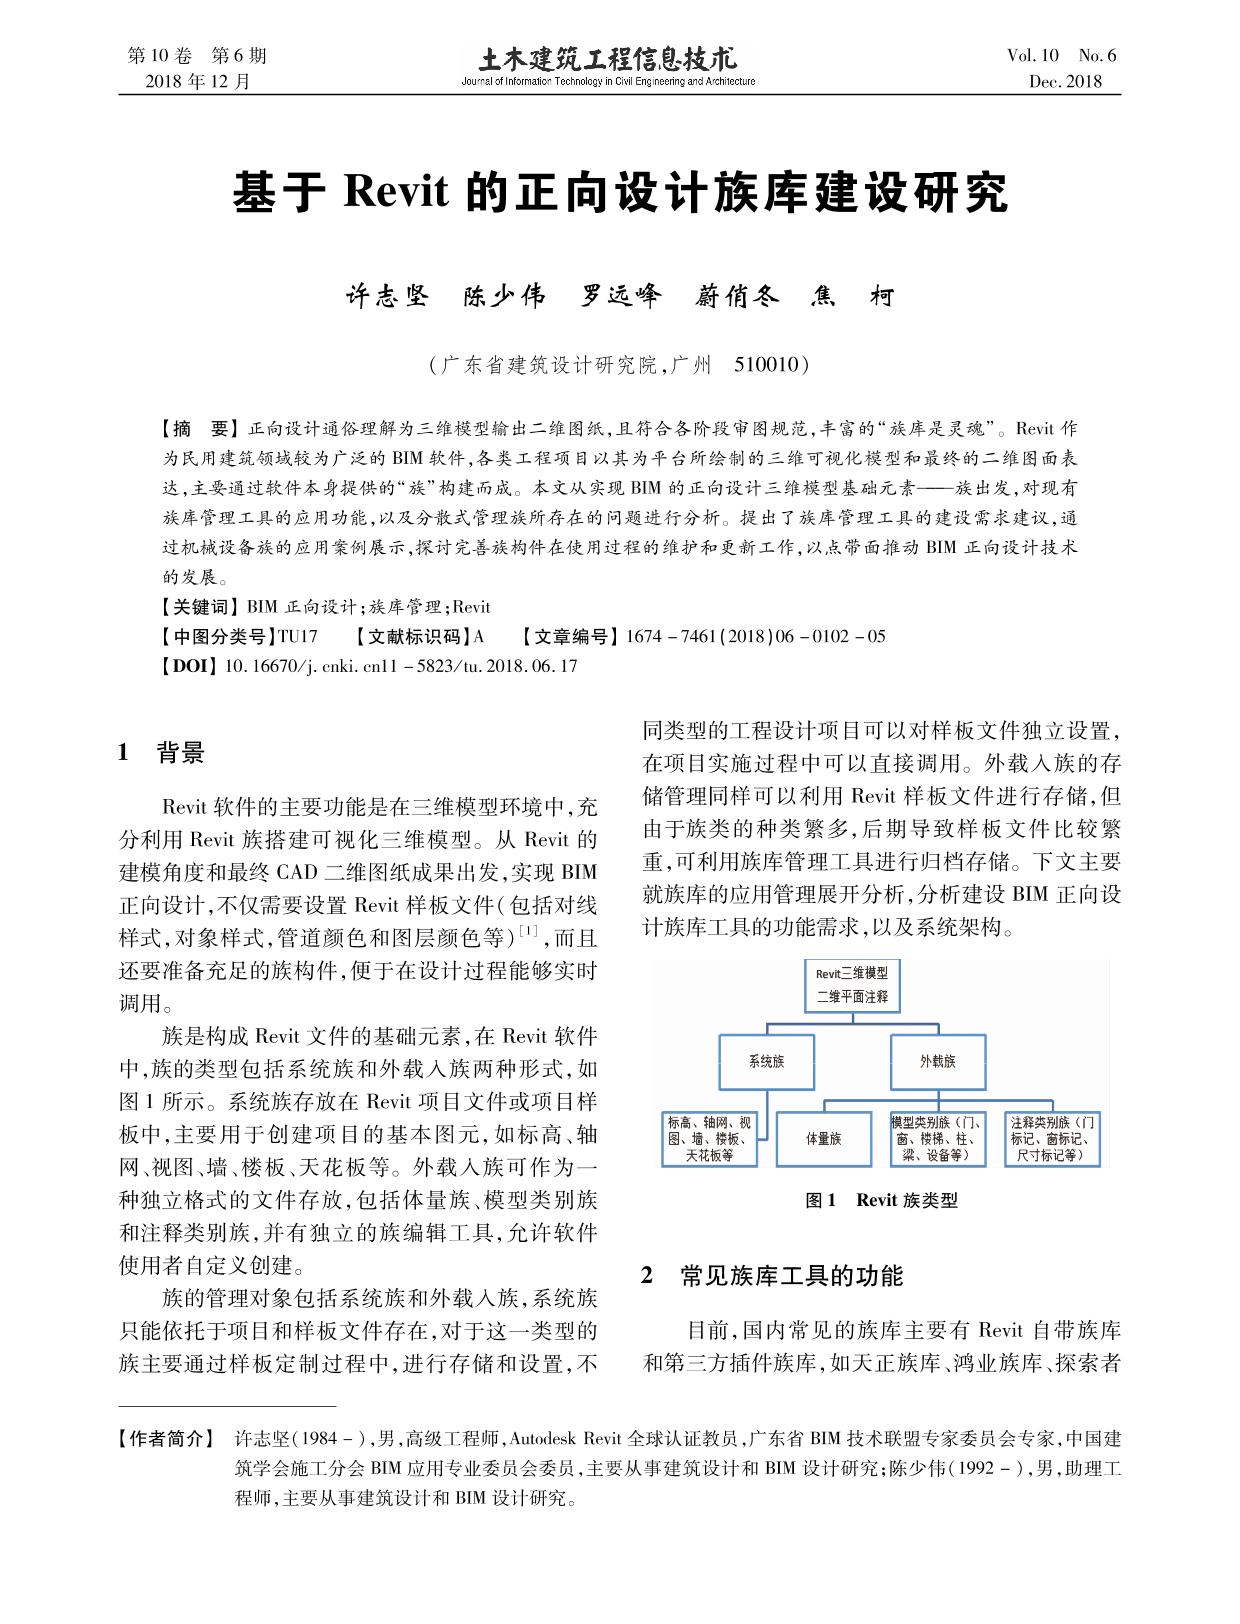 Research on Establishing Family Library in Revit for the Forward Design